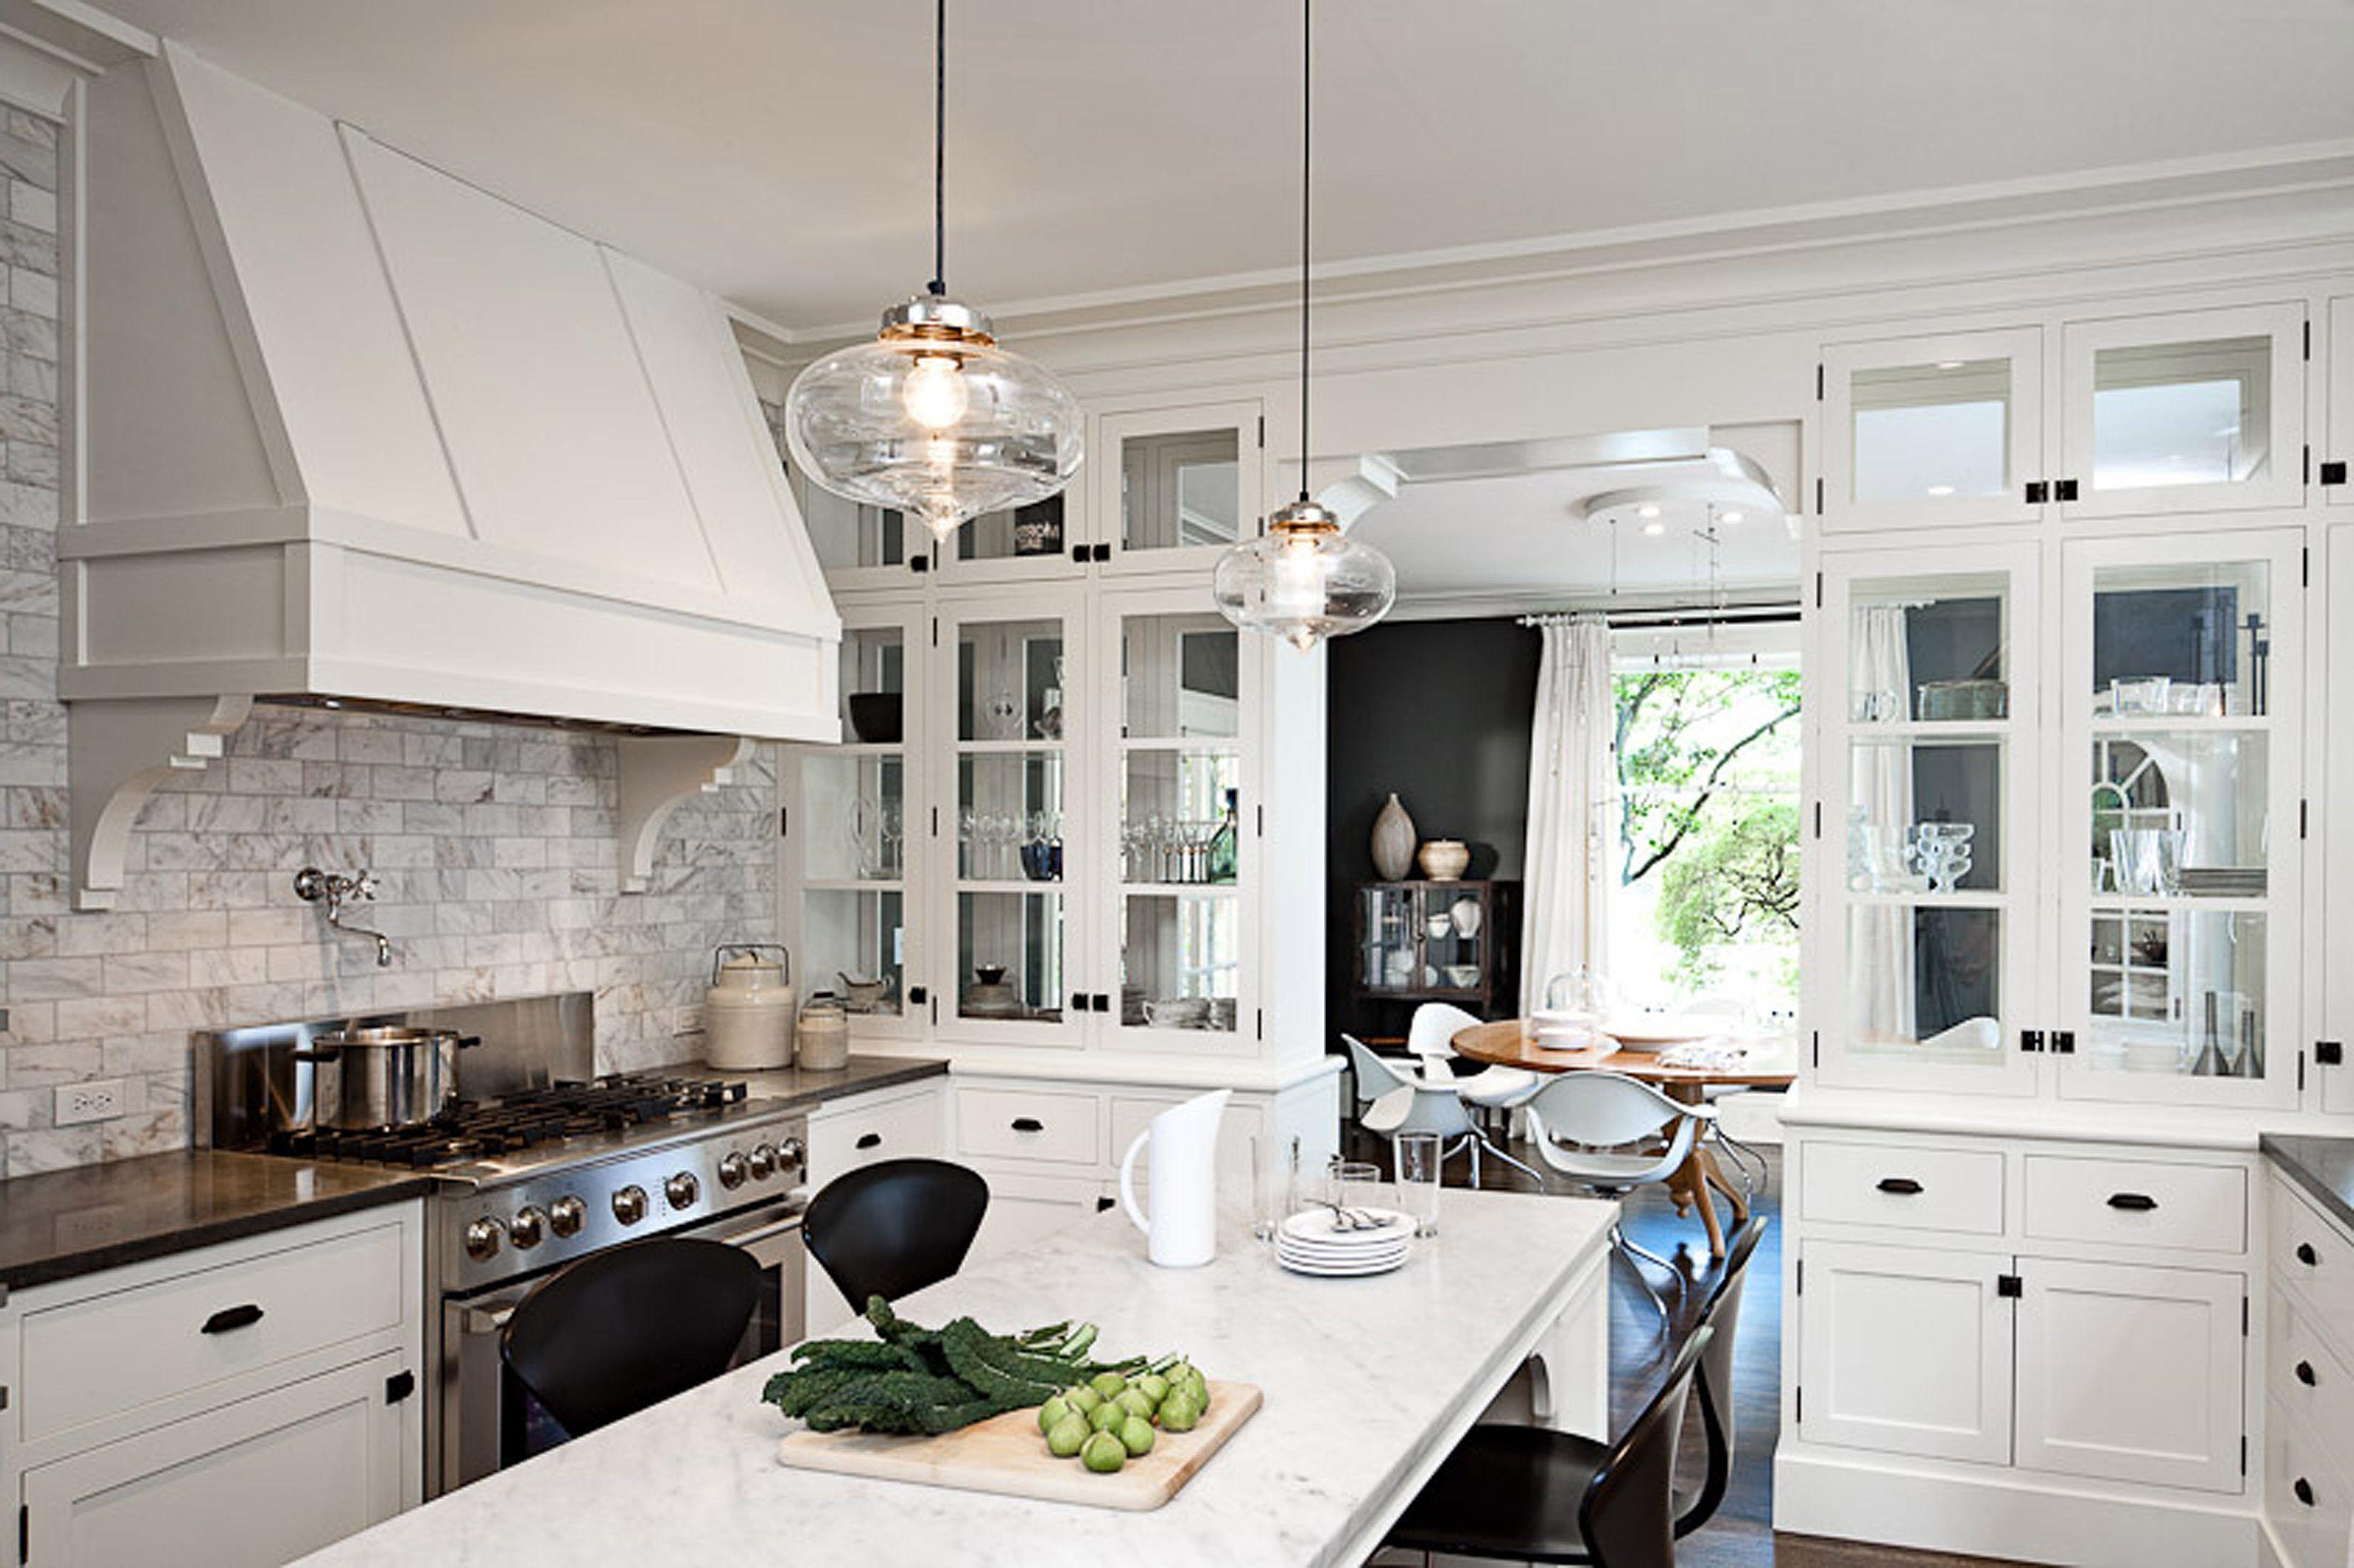 20 Beautiful Kitchen Island Pendant Lighting Ideas to